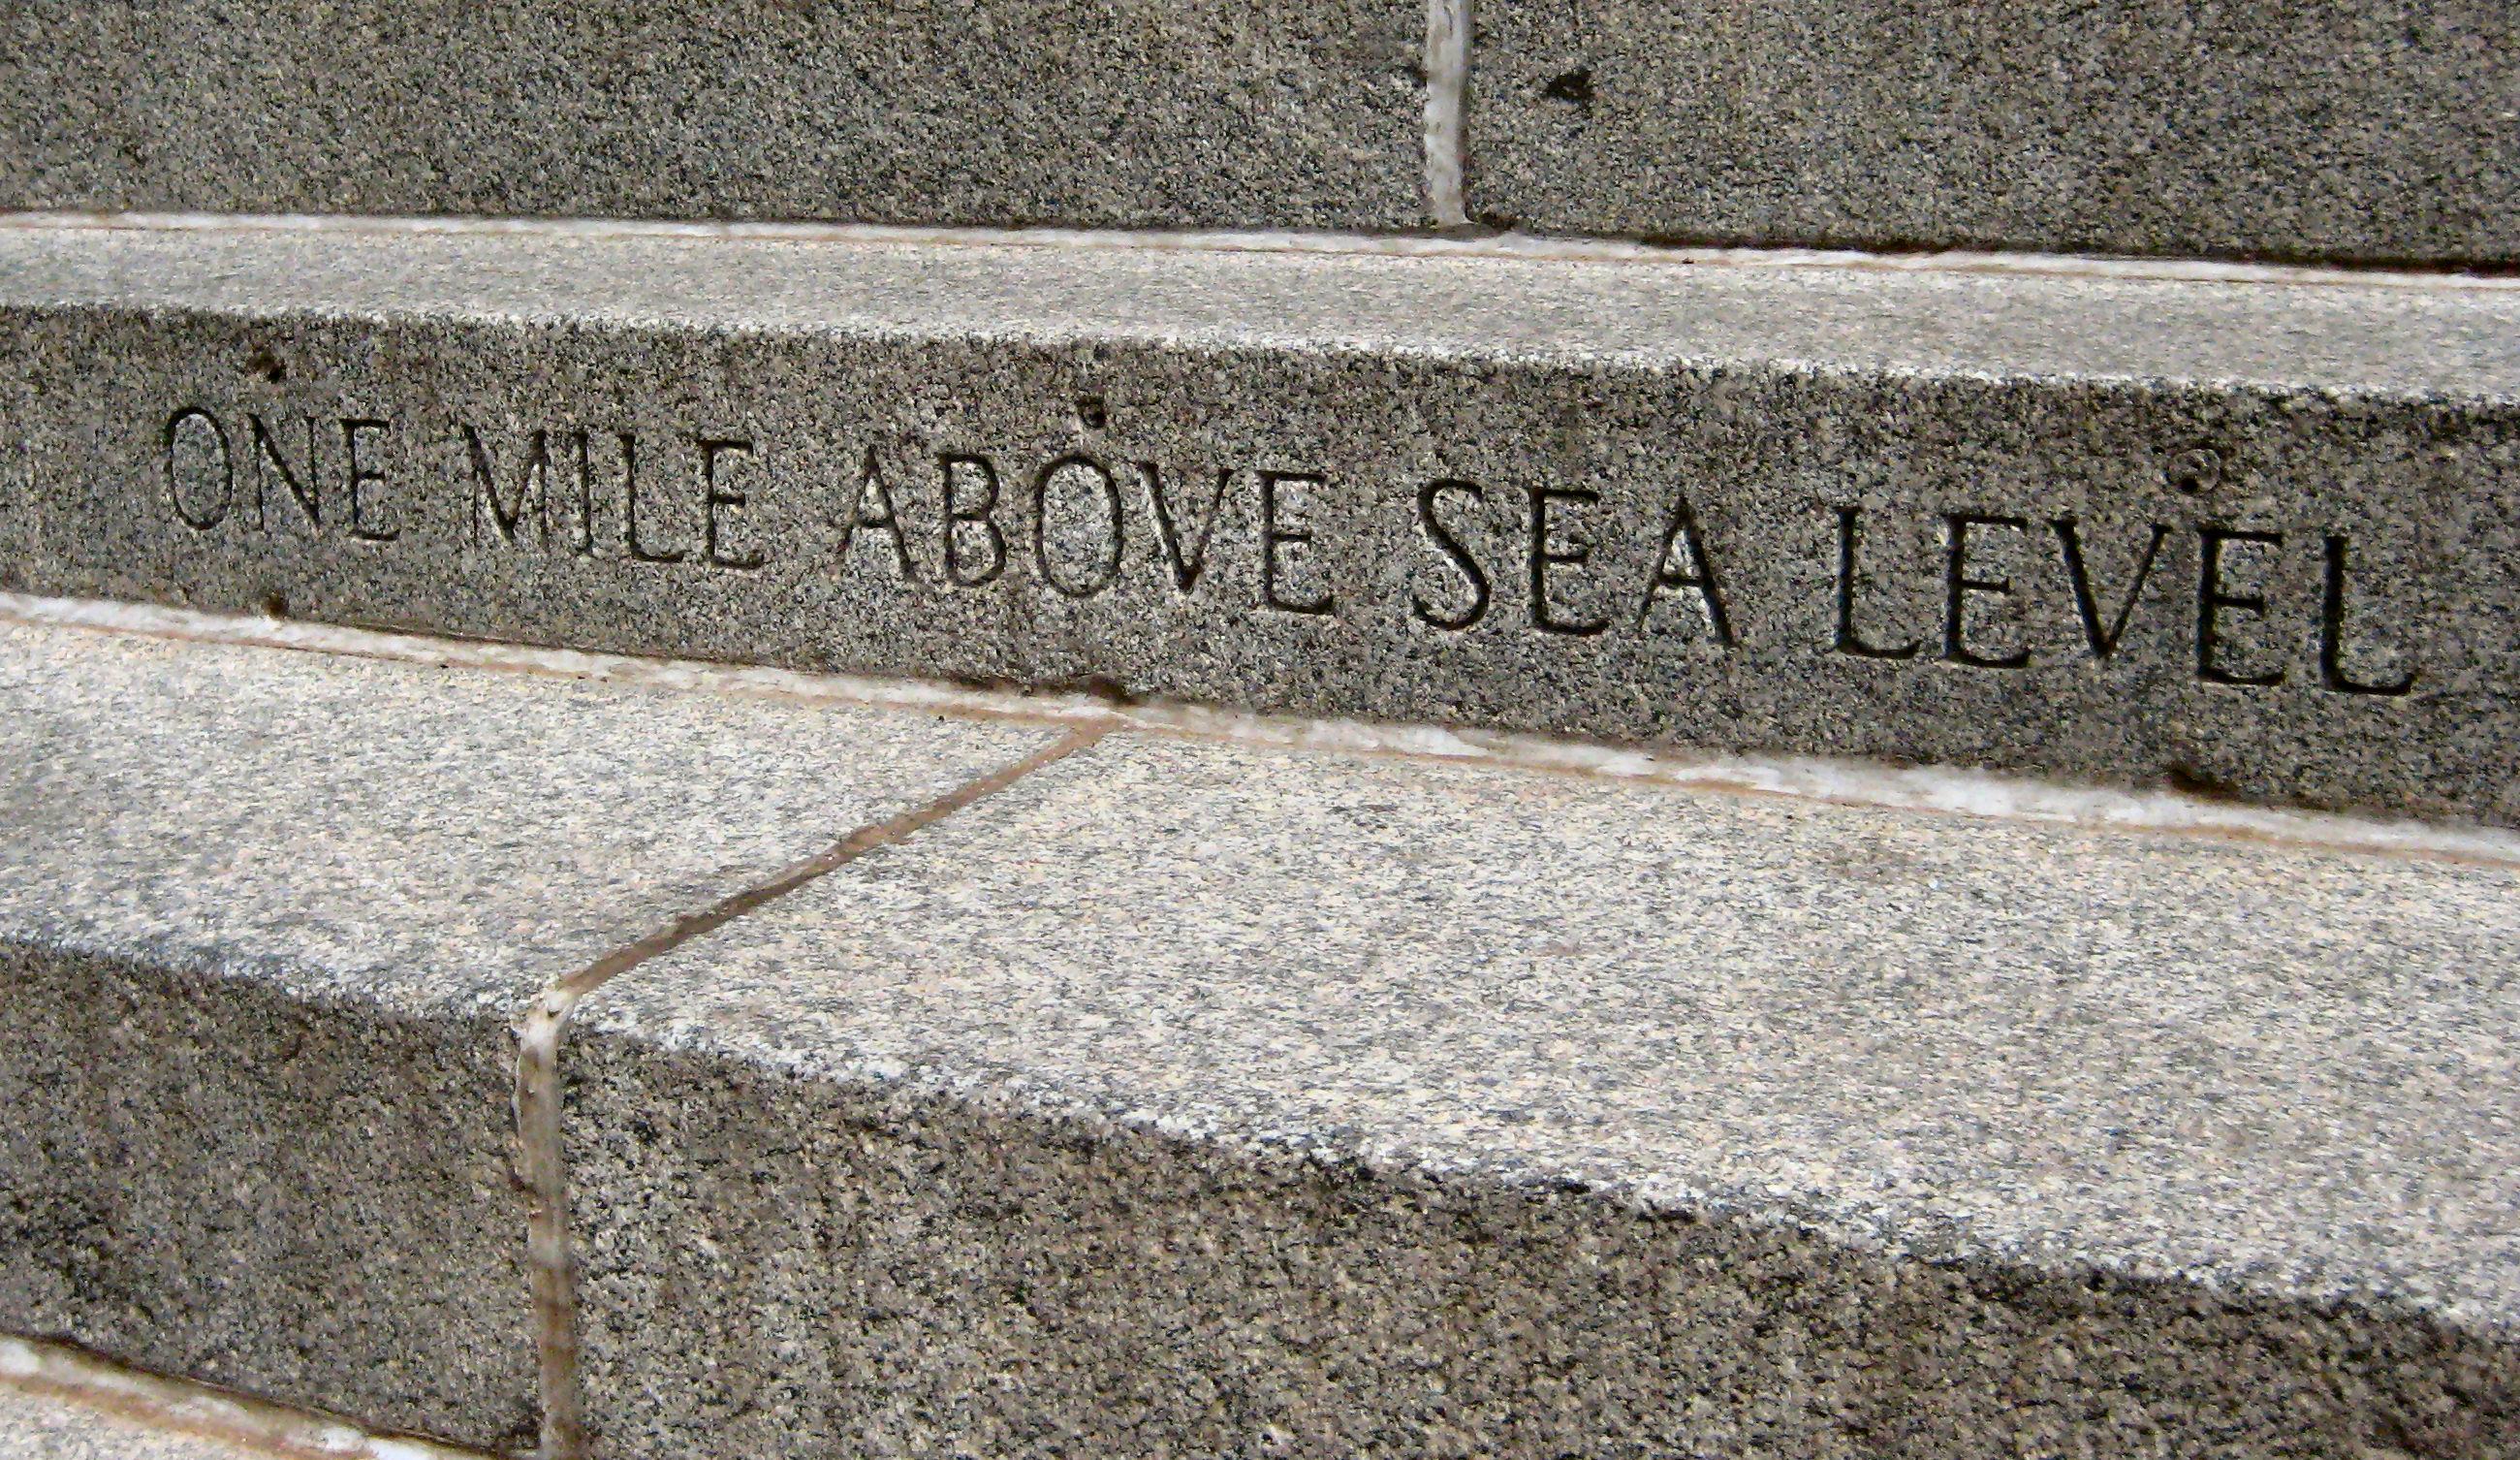 FileOne Mile Above Sea Leveljpg Wikimedia Commons - Level above sea level